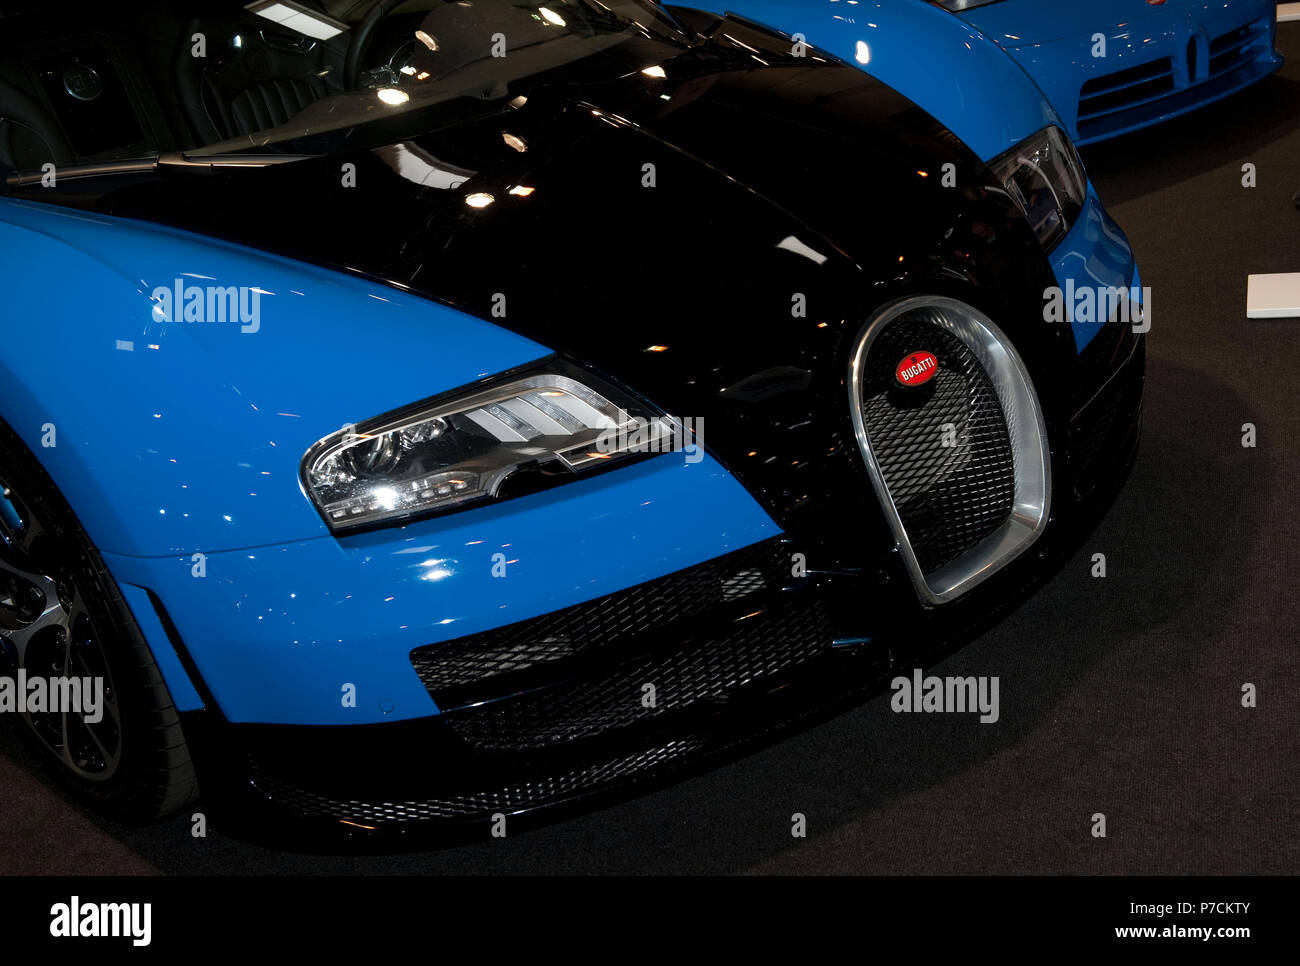 bugatti veyron 16.4 grand sport vitesse, 16 cylinder, 1200 hp